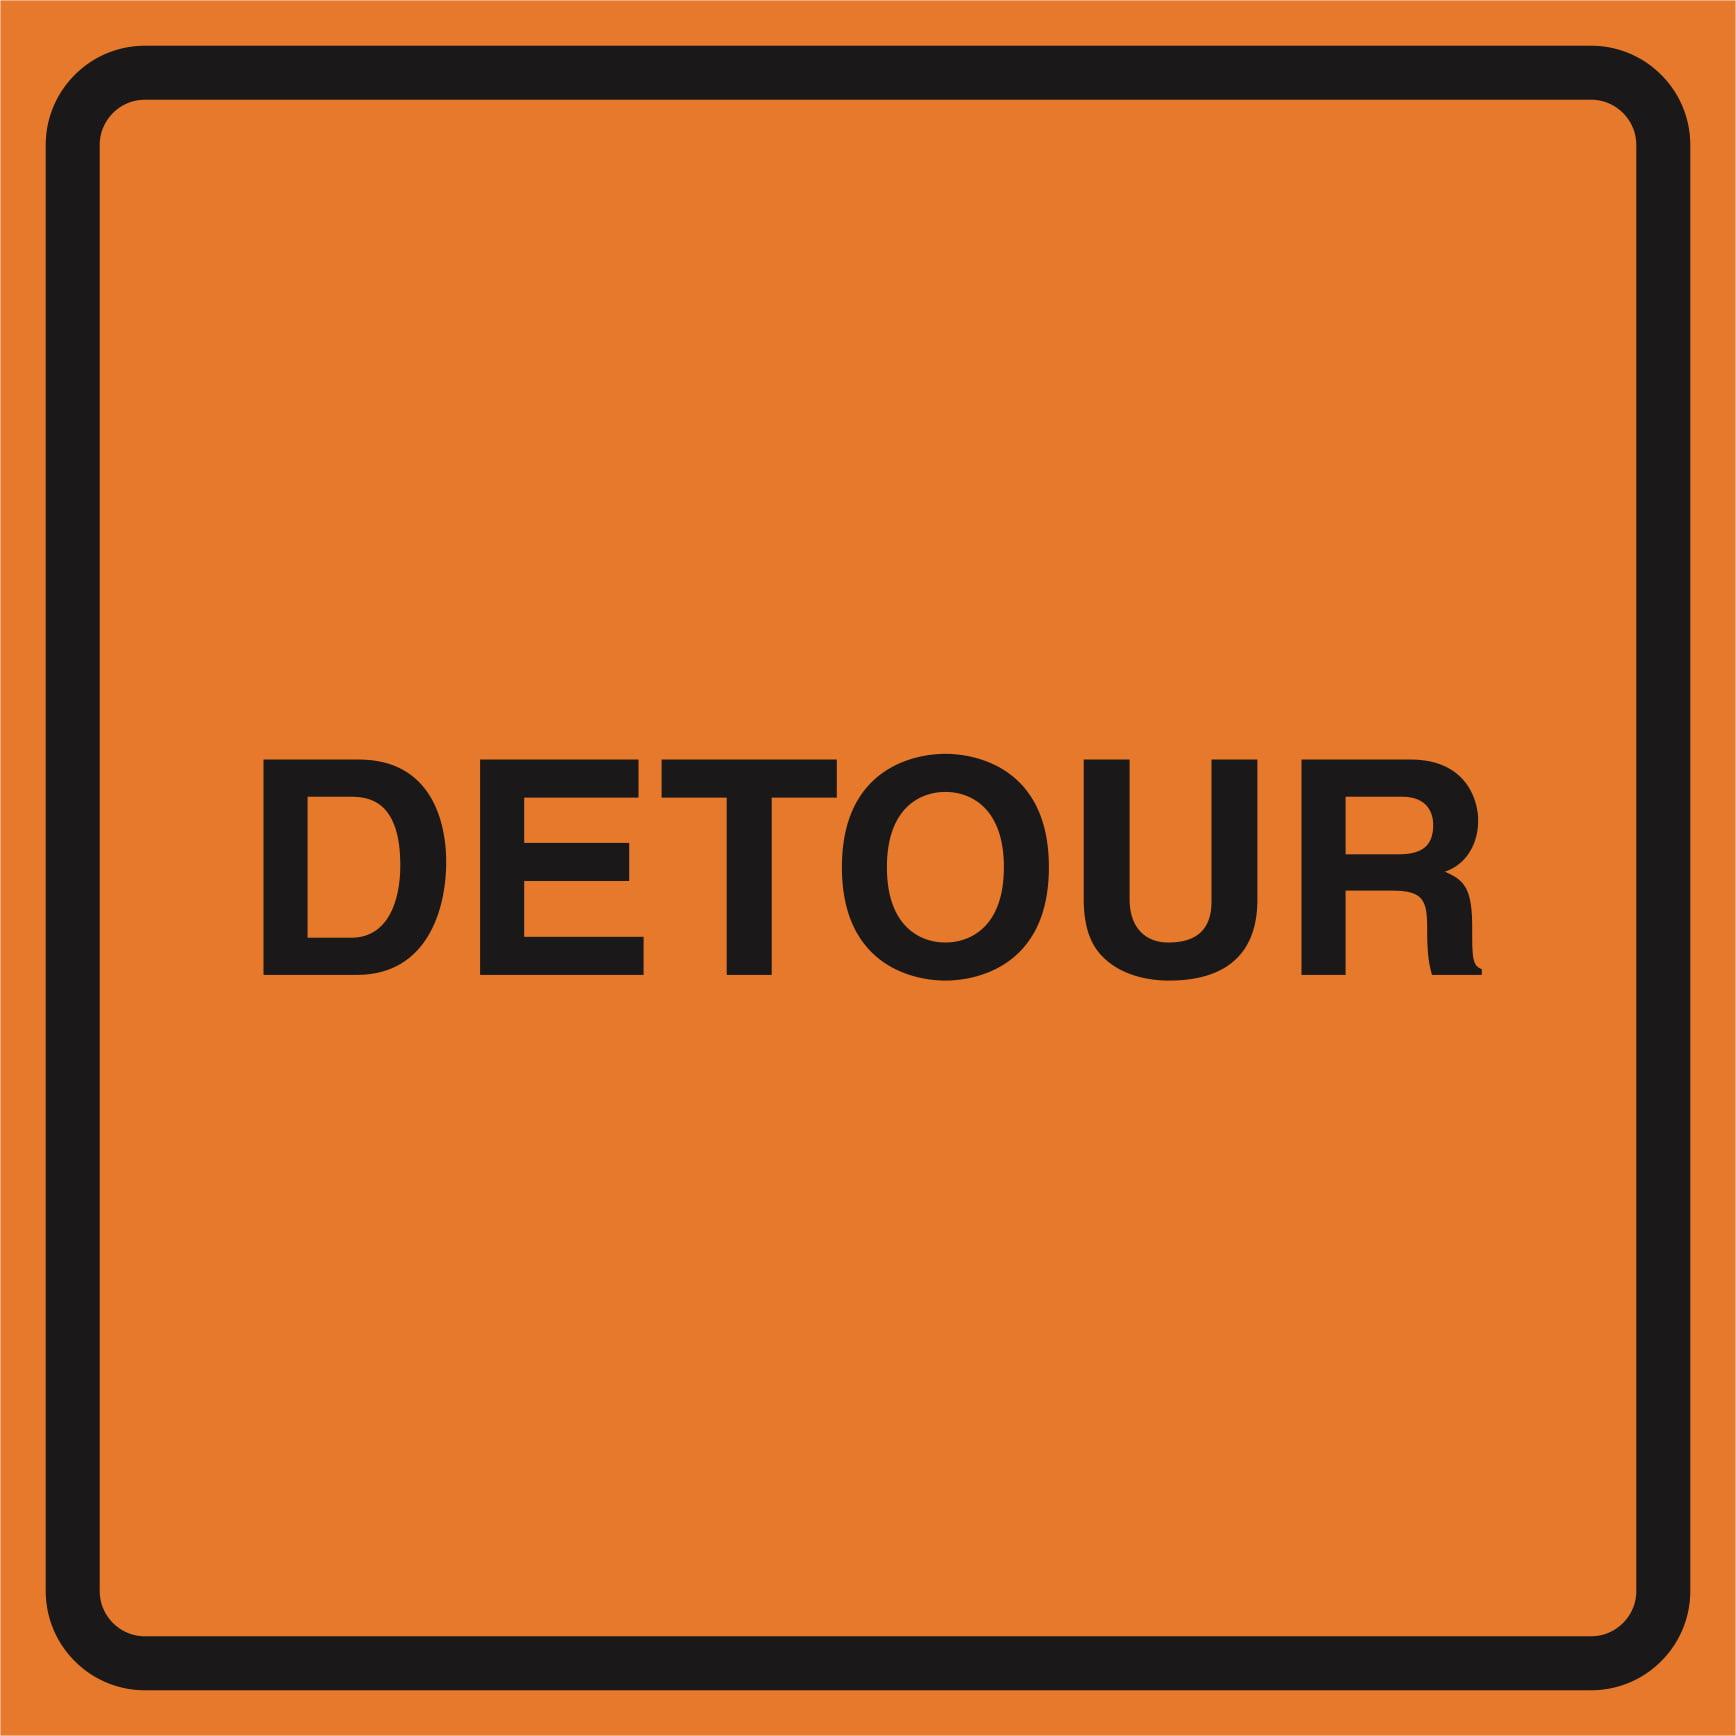 Detour Orange Construction Work Zone Area Job Site Notice